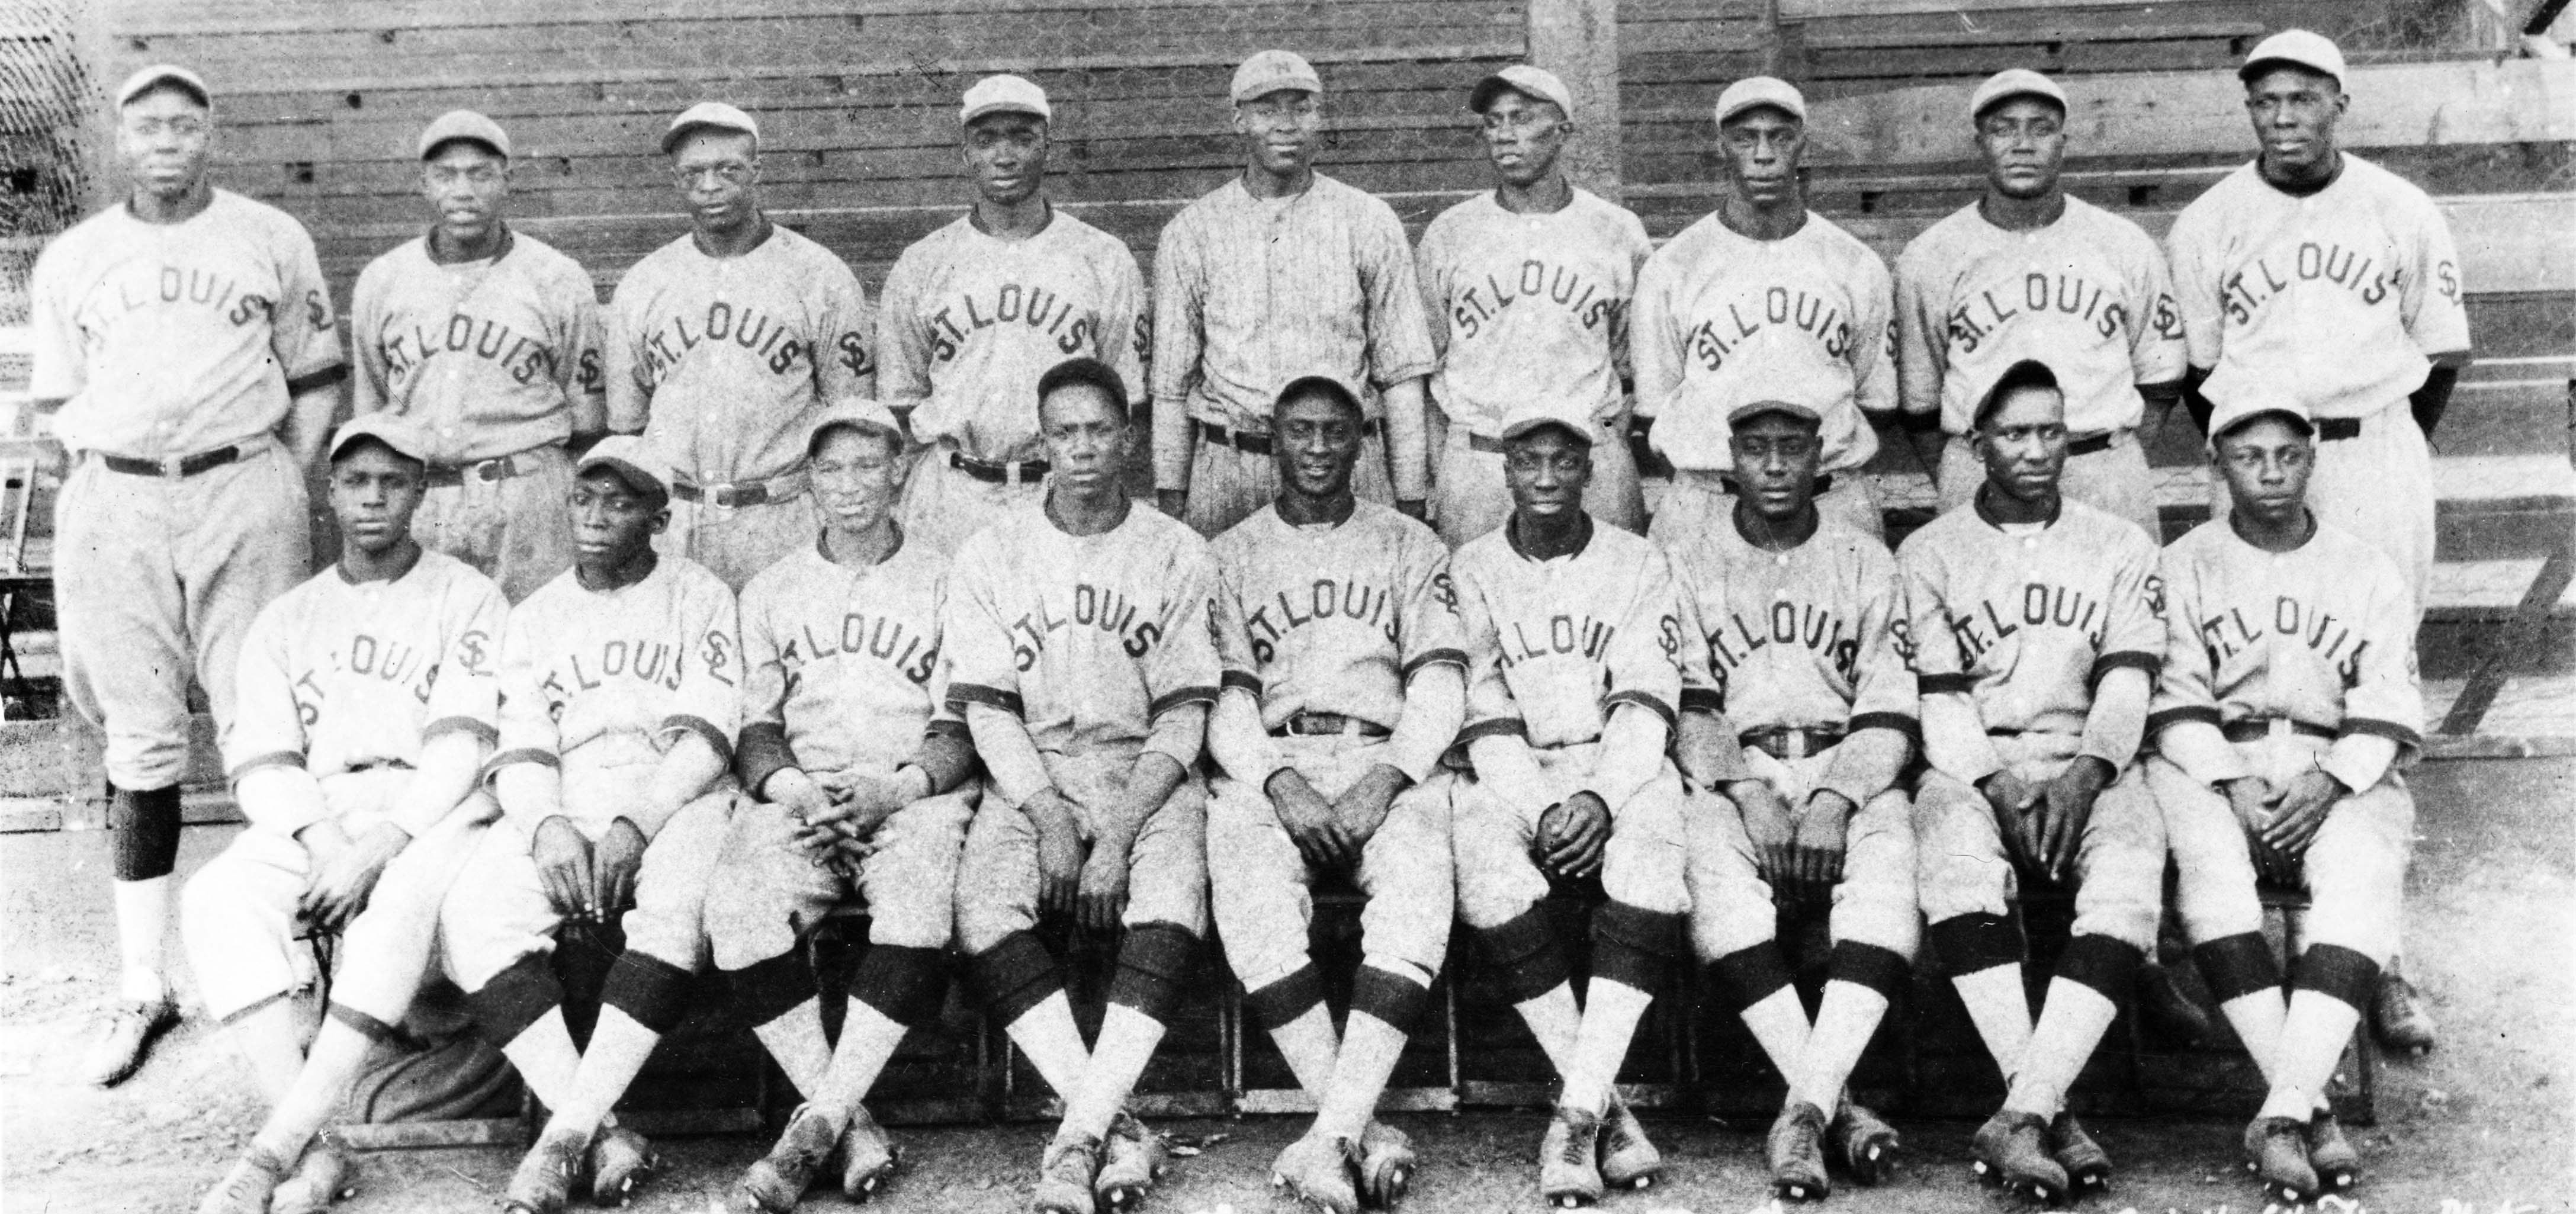 St. Louis Stars 1930